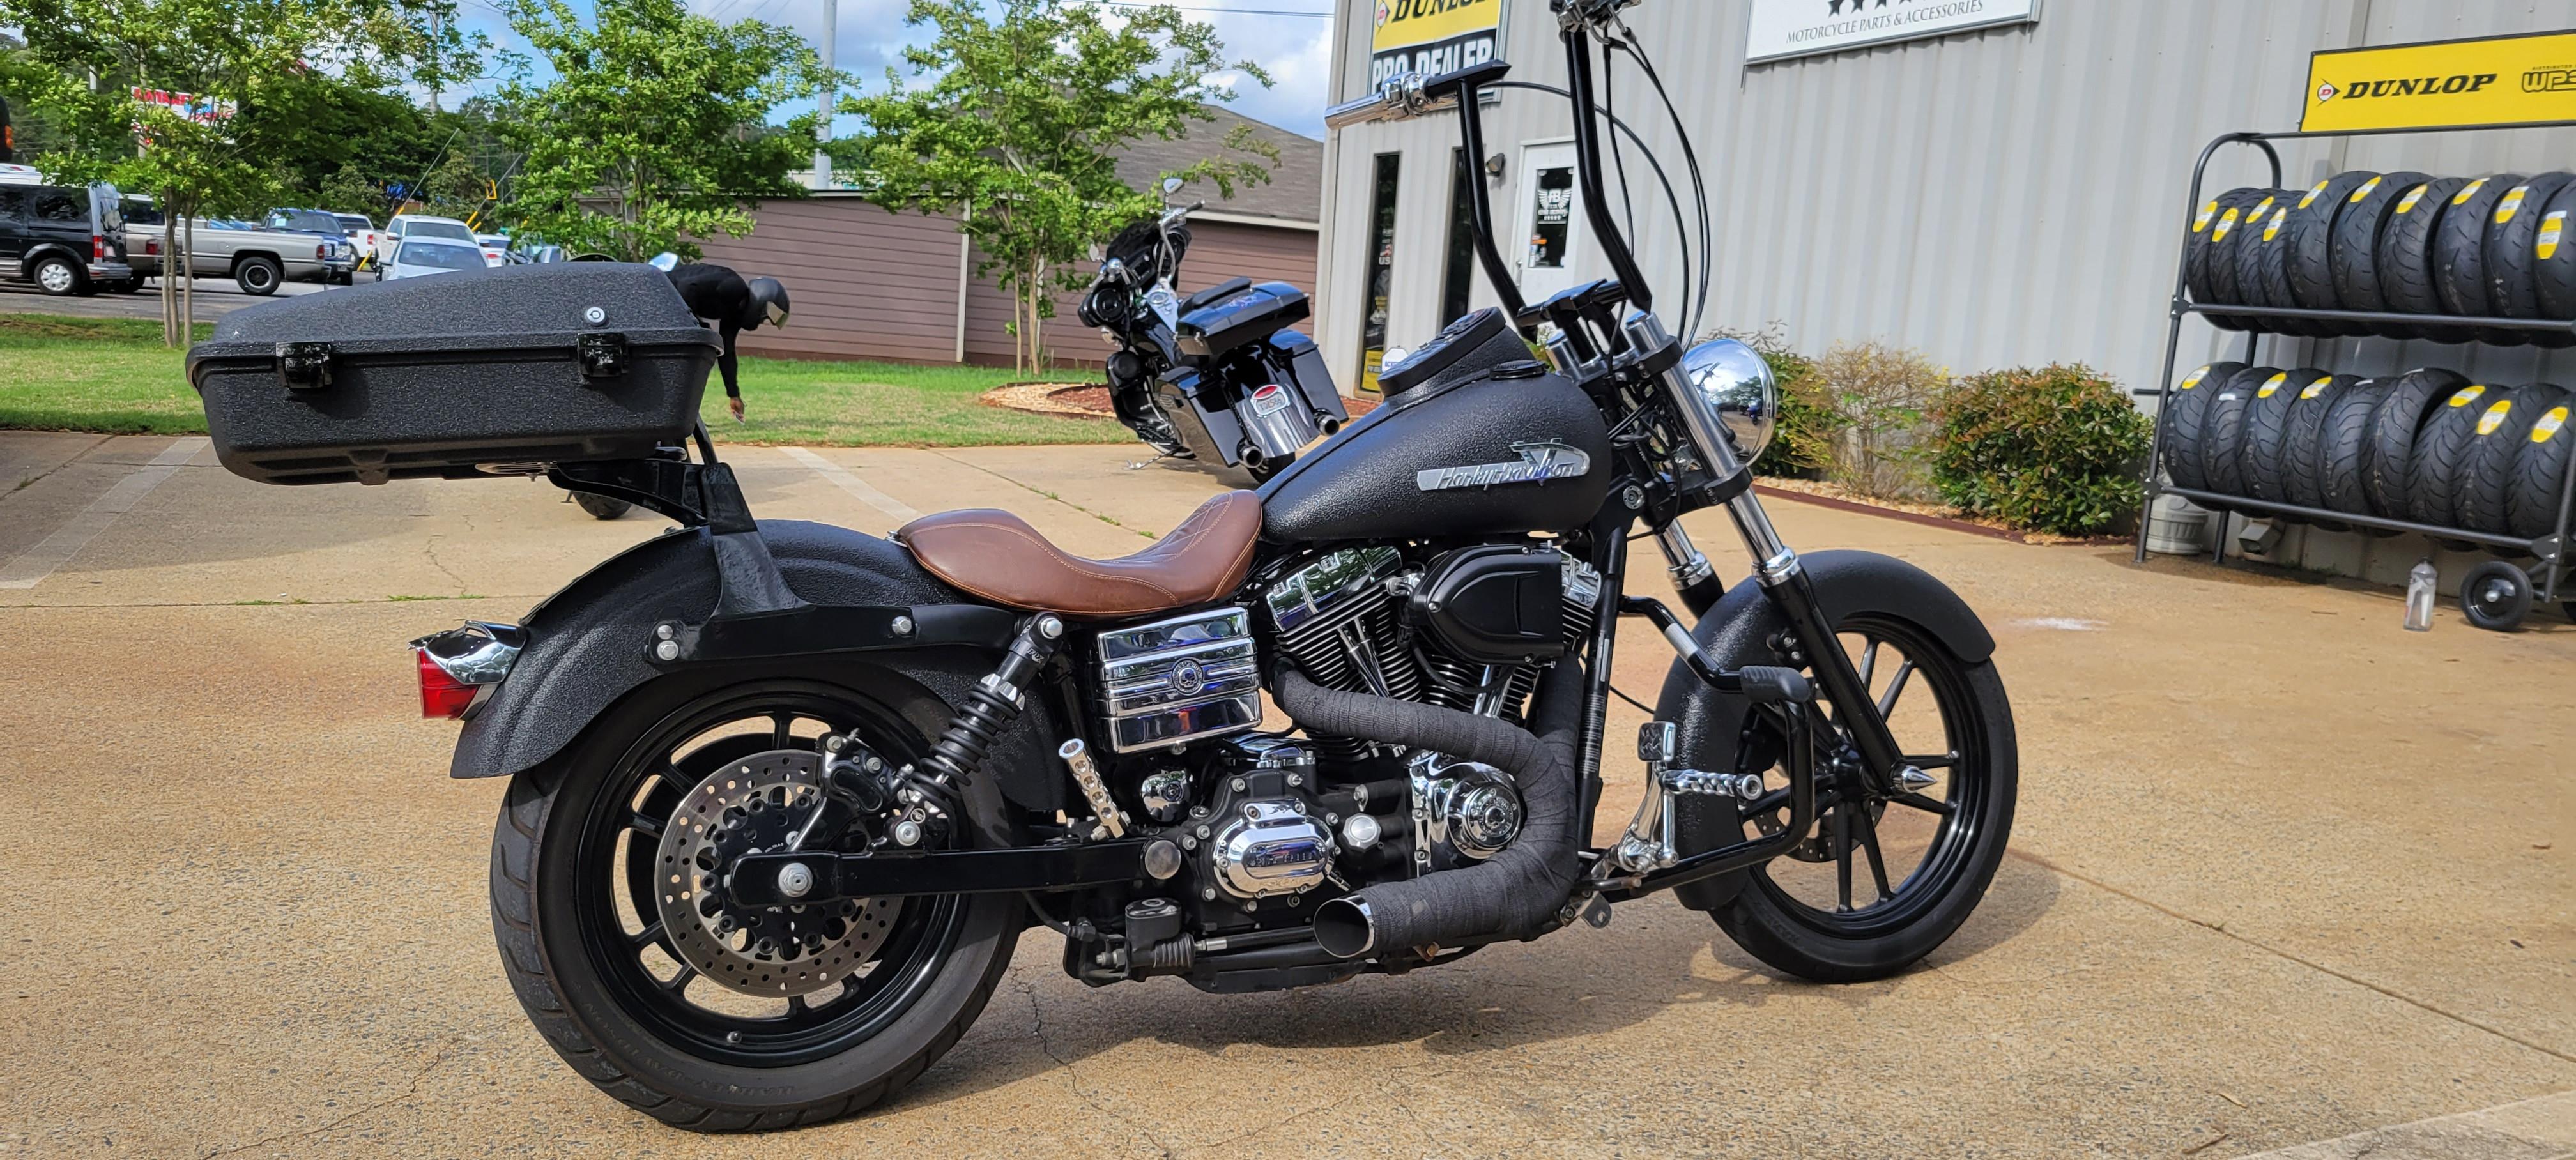 Harley-davidson Custom Hire Norcross